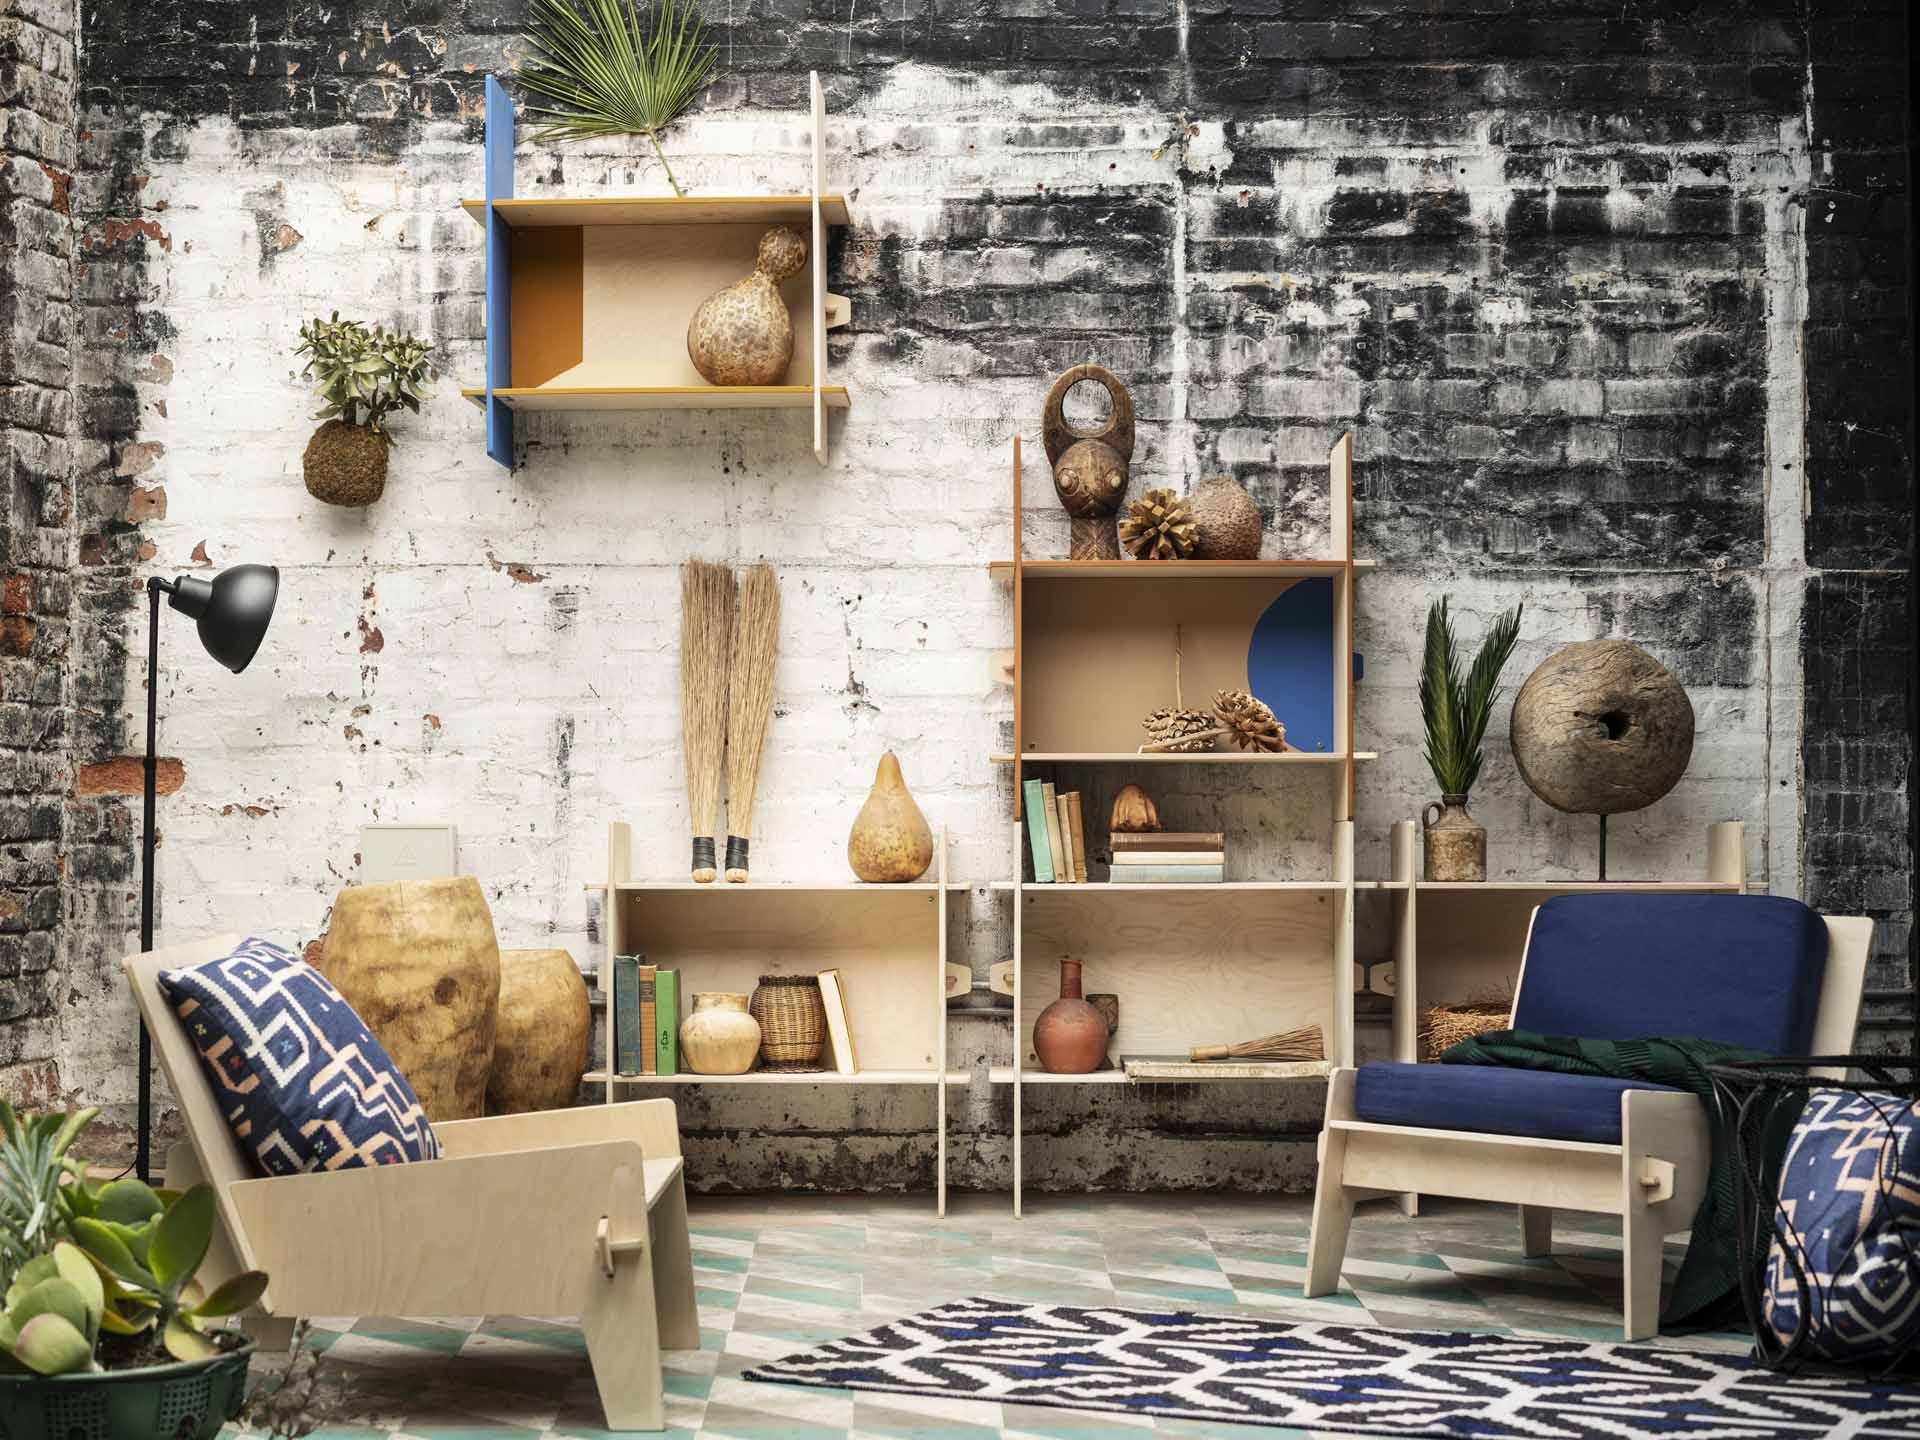 La Collection Déco Africaine Ikea Överallt - Cdeco.fr dedans Mobilier De Jardin Ikea